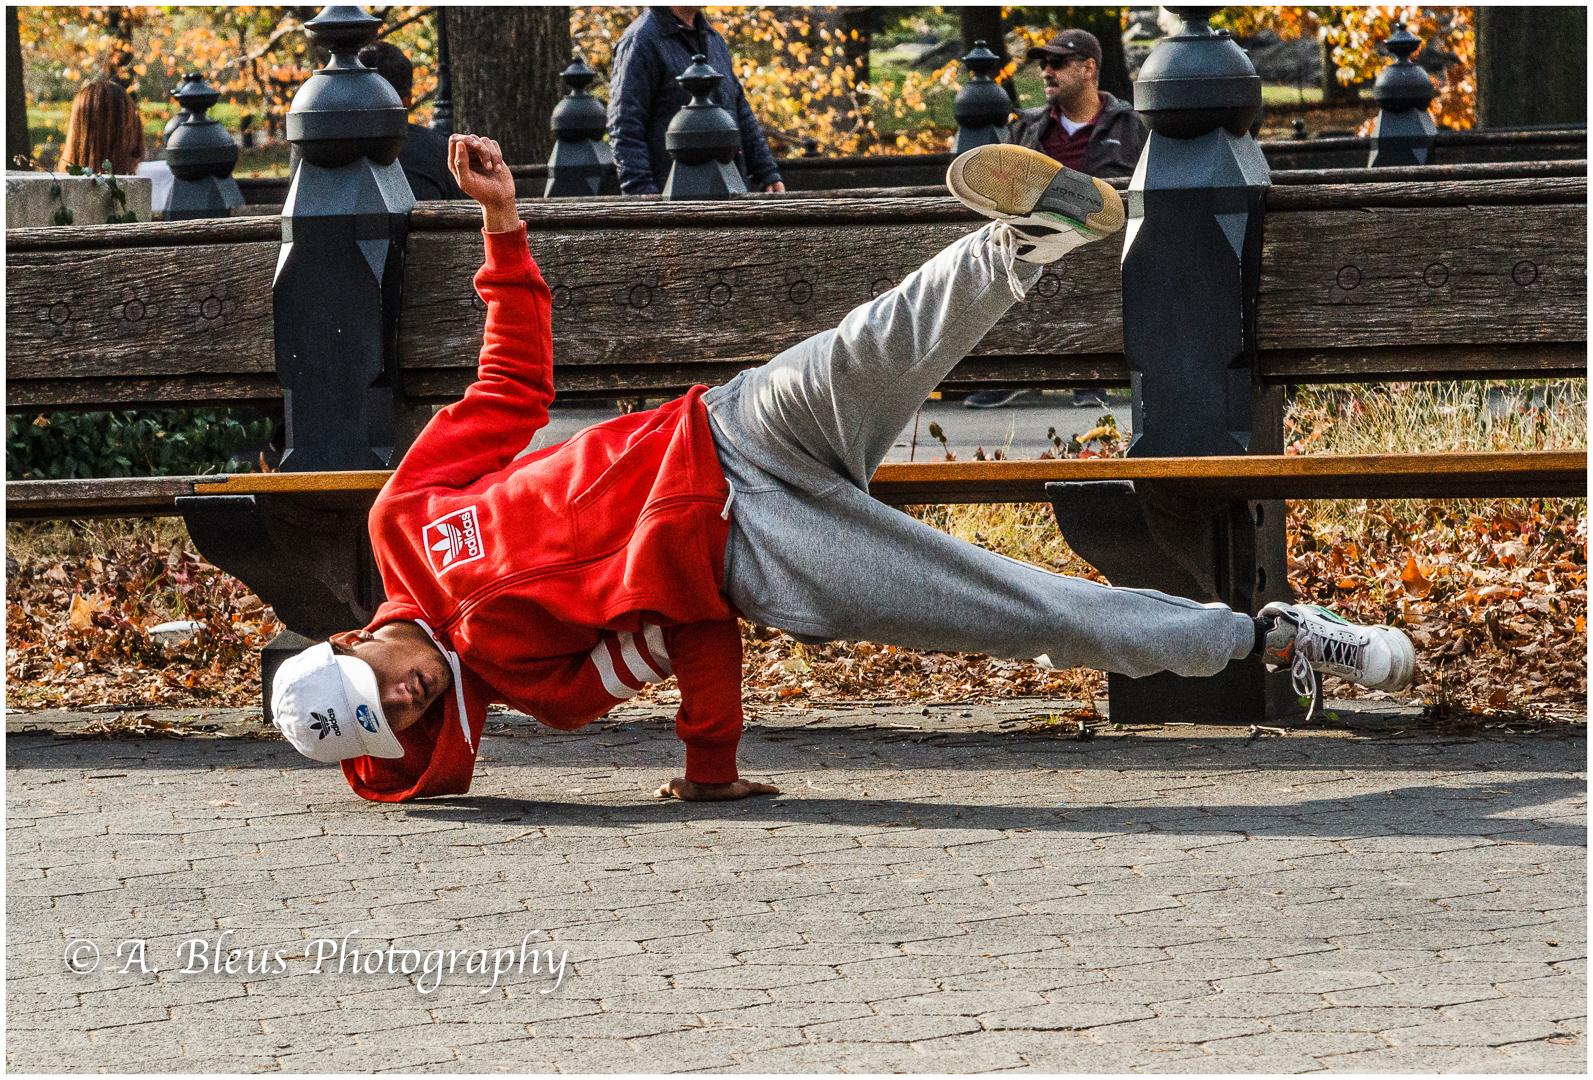 gymnast-in-central-park-ny-mg_1256-1